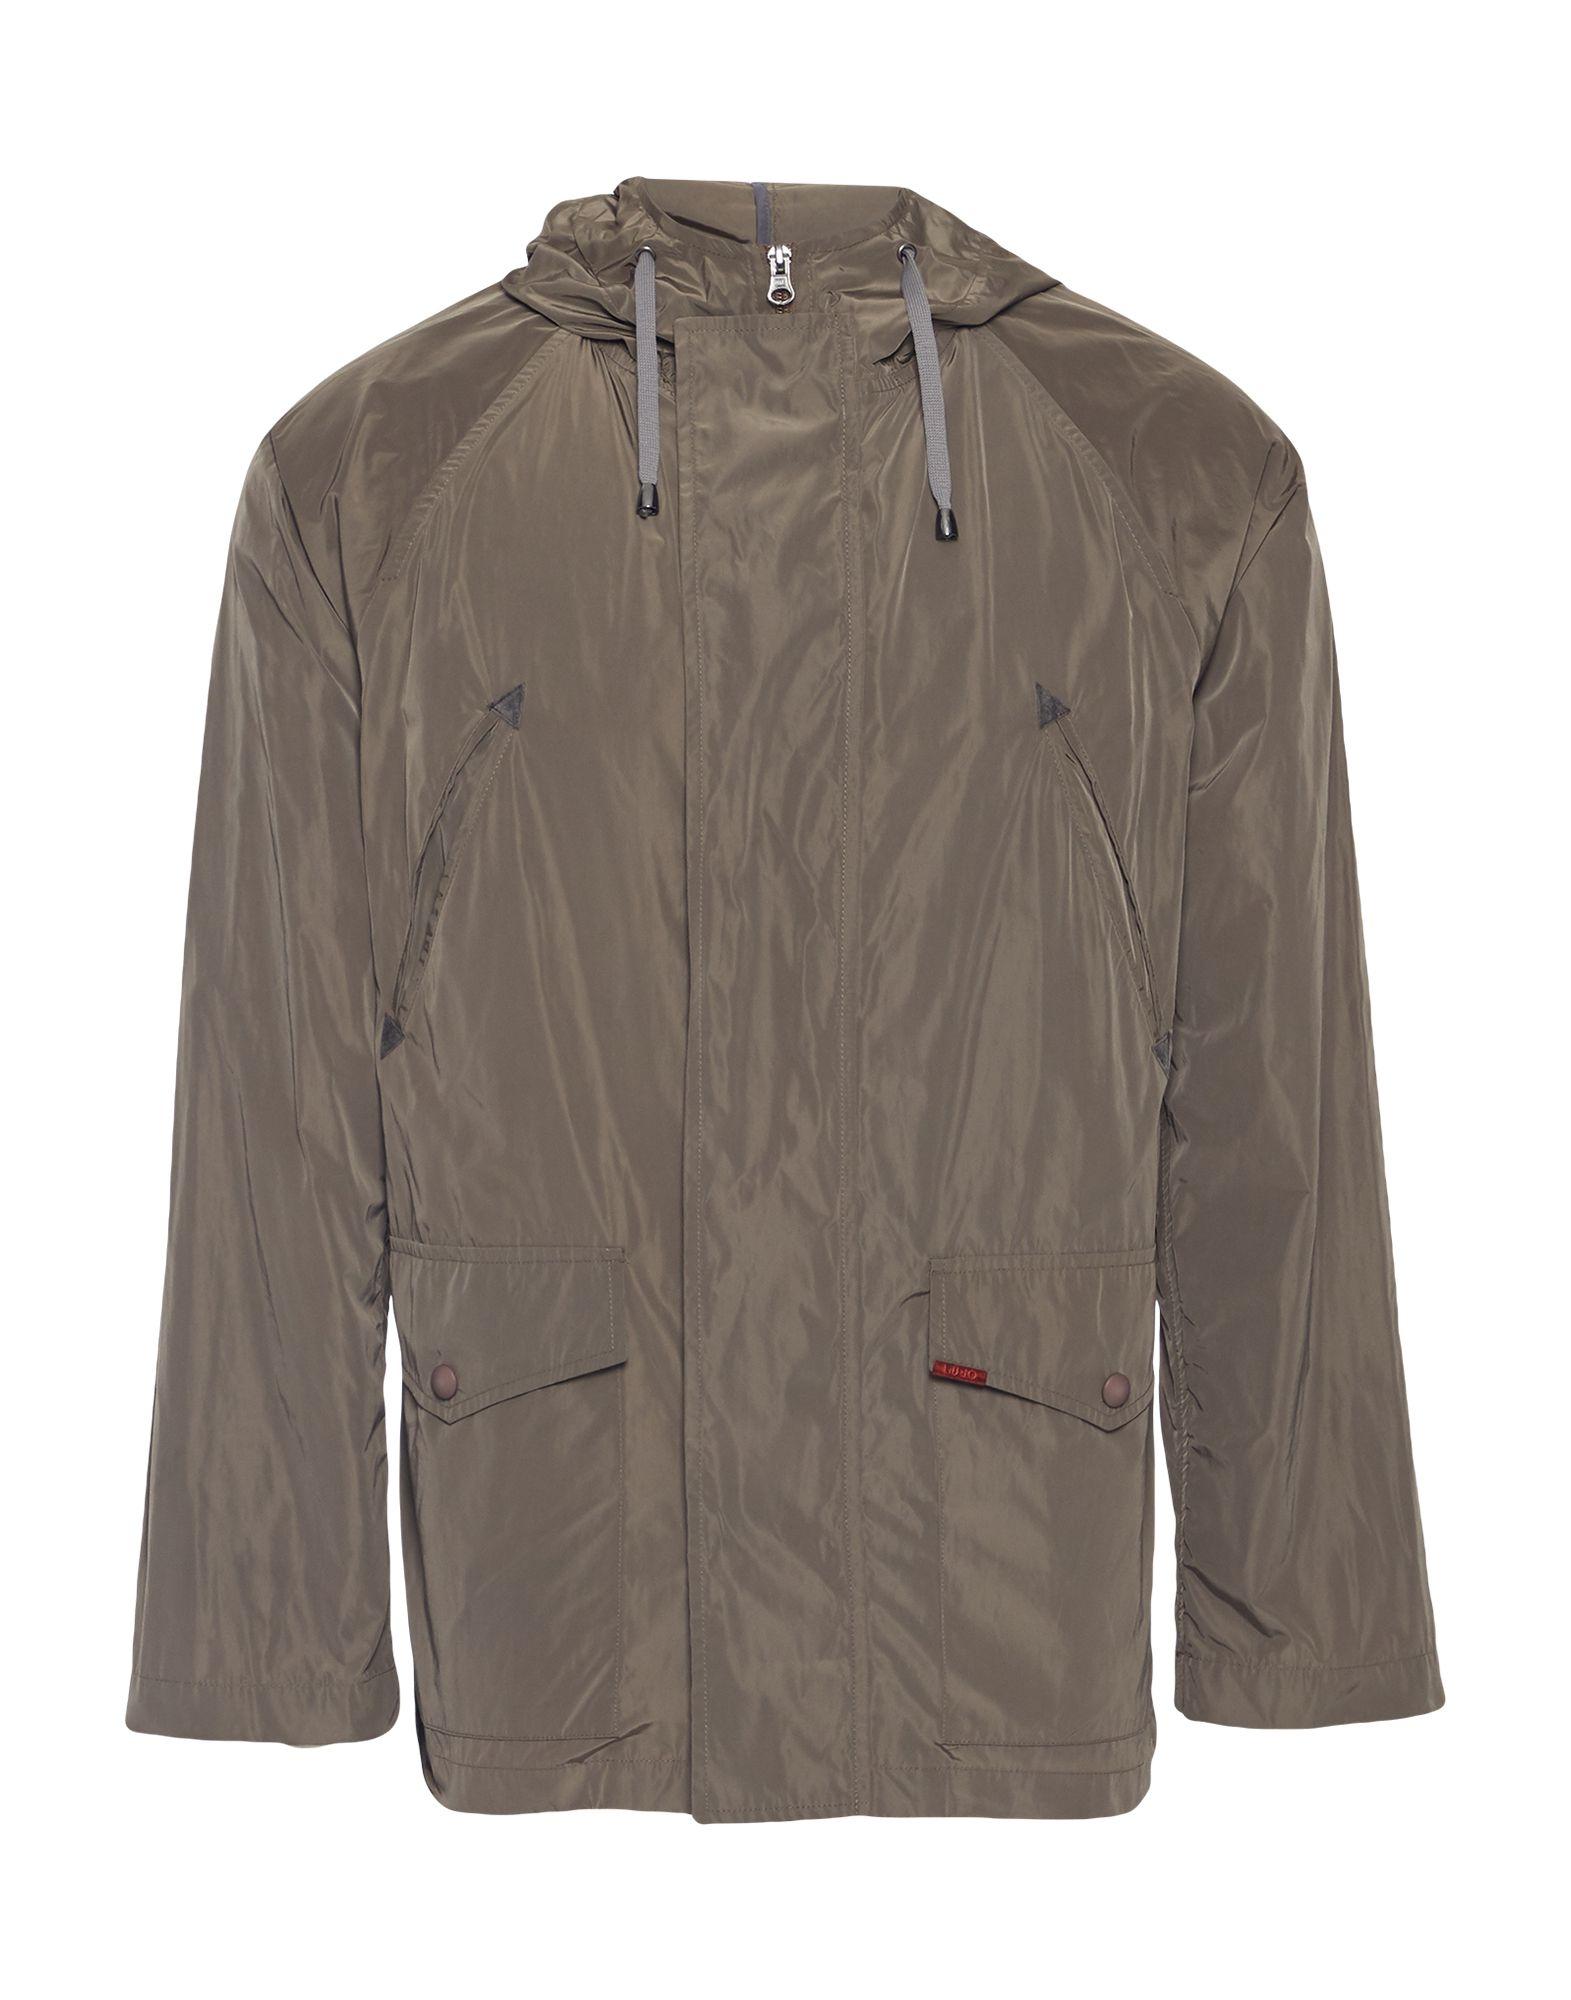 wholesale dealer 1073c c87c1 LIU •JO Jacket - Coats and Jackets | YOOX.COM